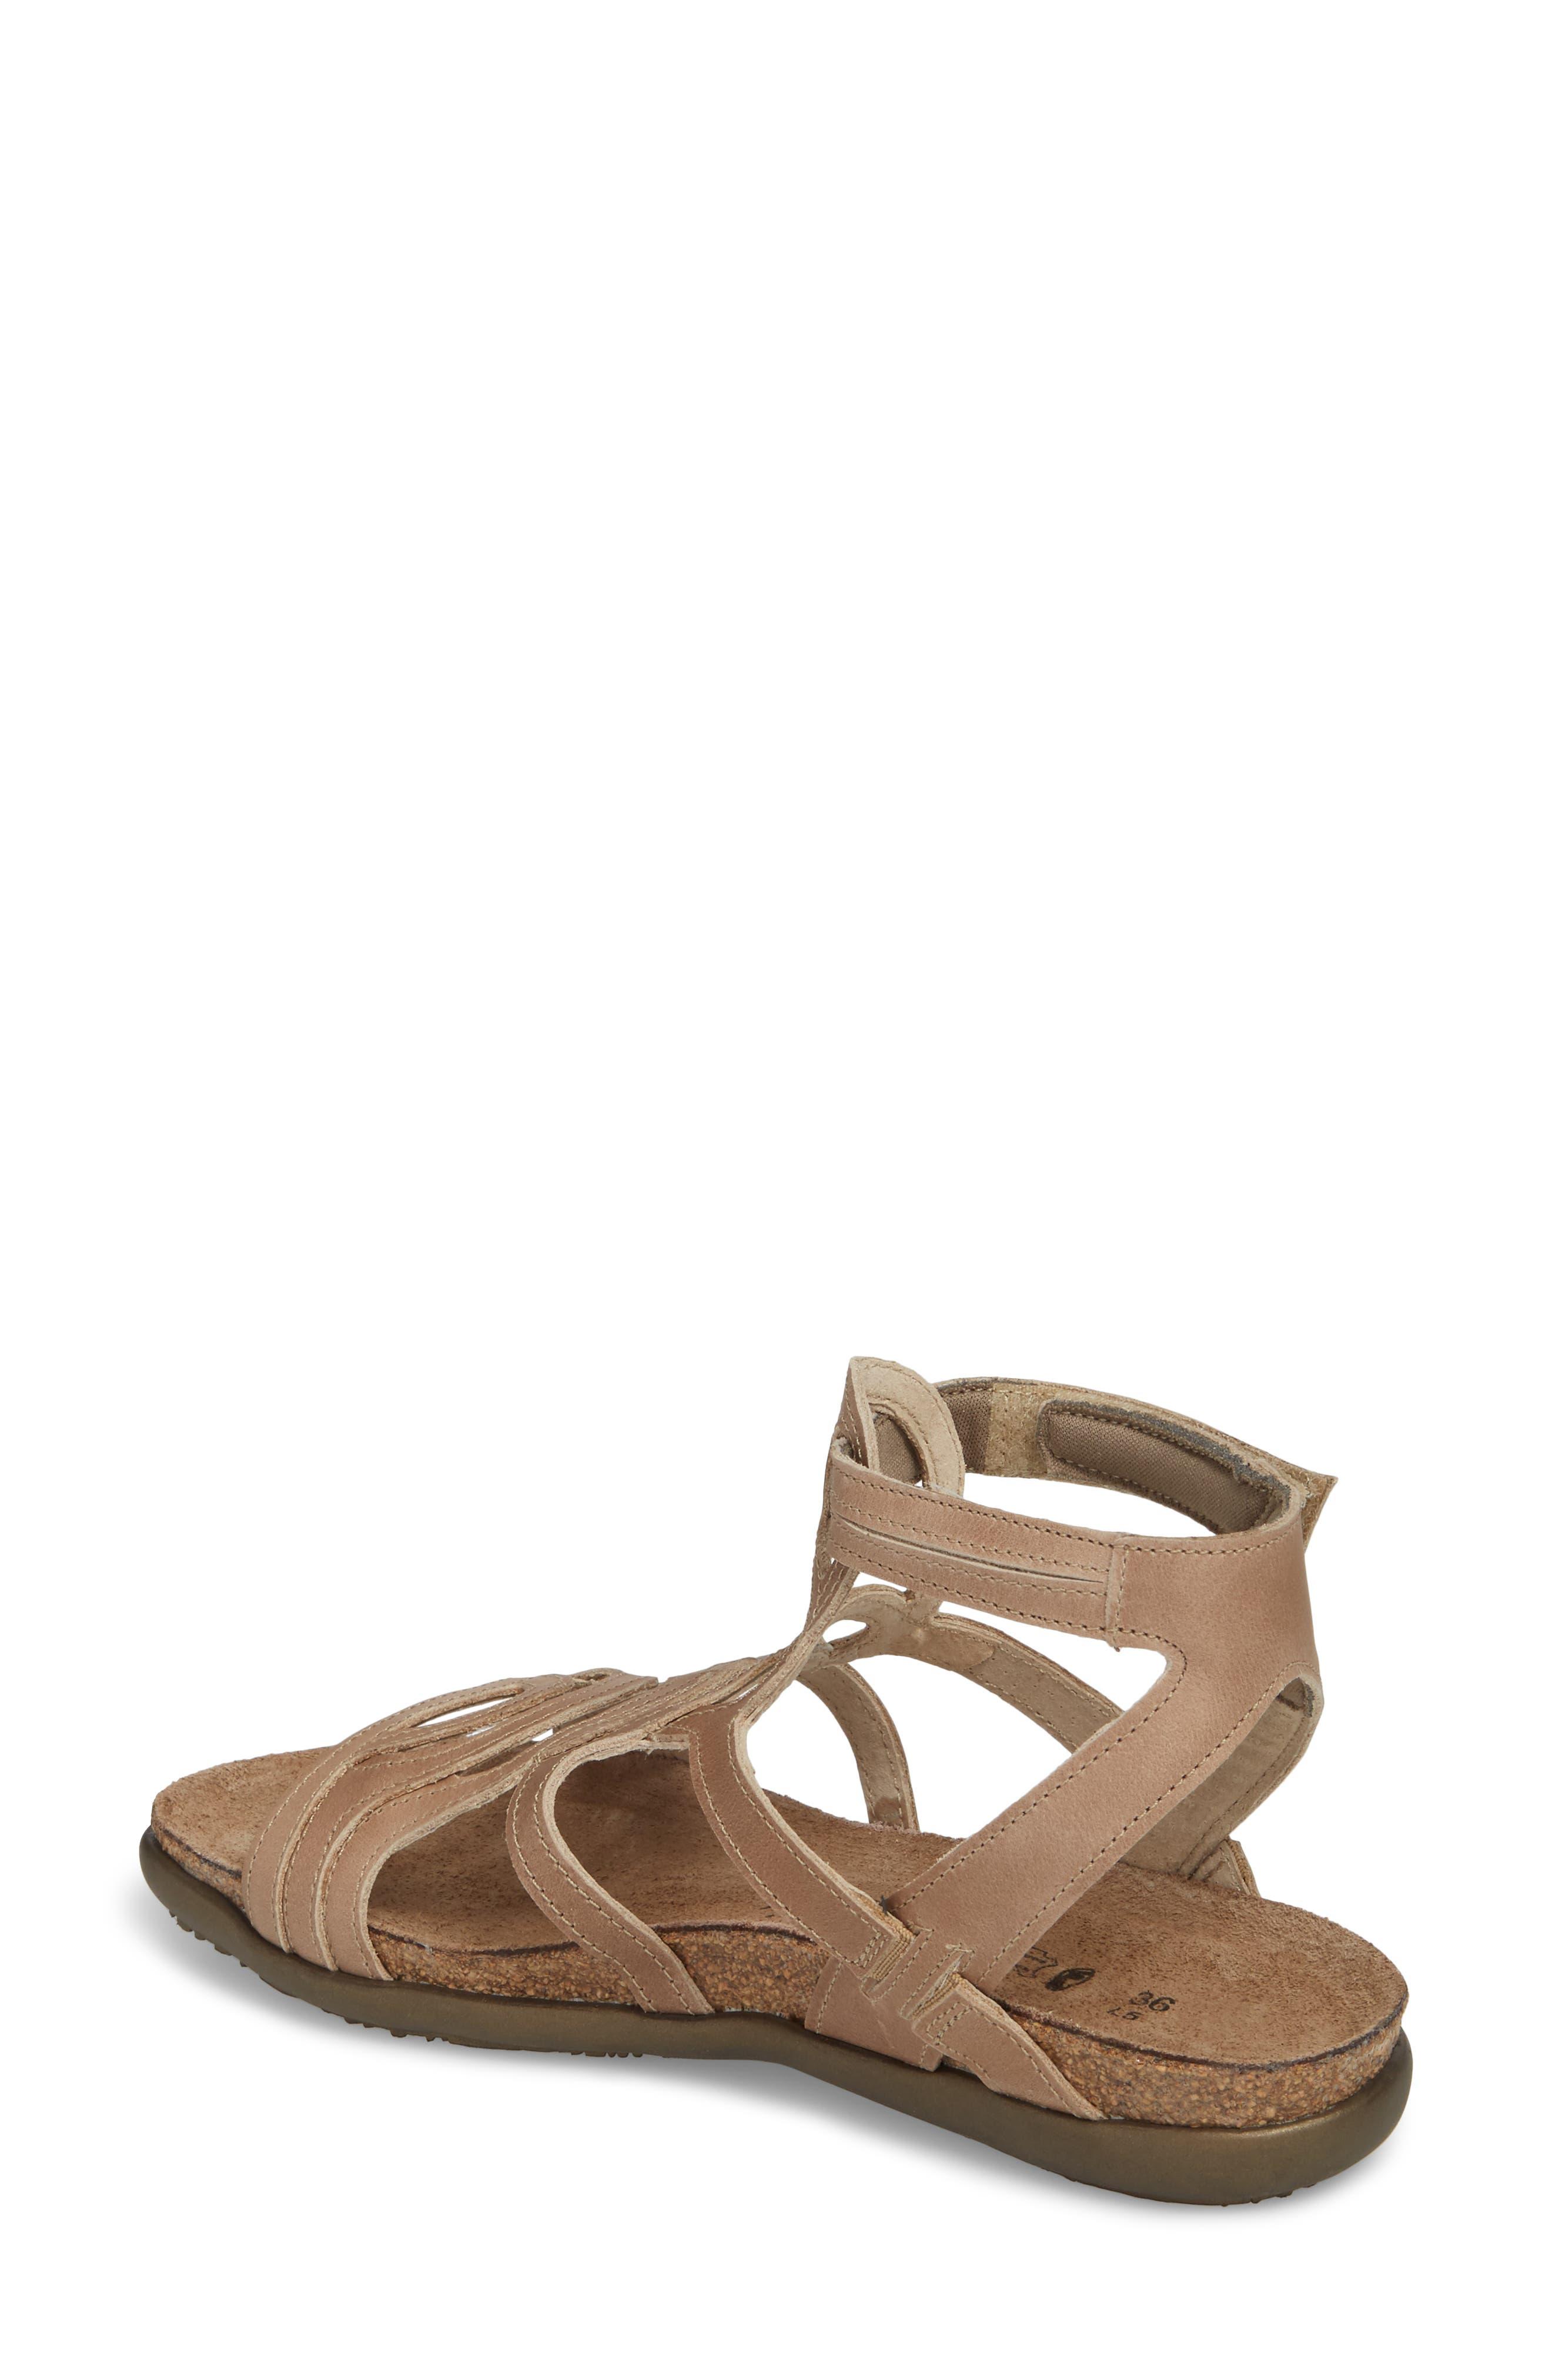 'Sara' Gladiator Sandal,                             Alternate thumbnail 2, color,                             Khaki Beige Leather